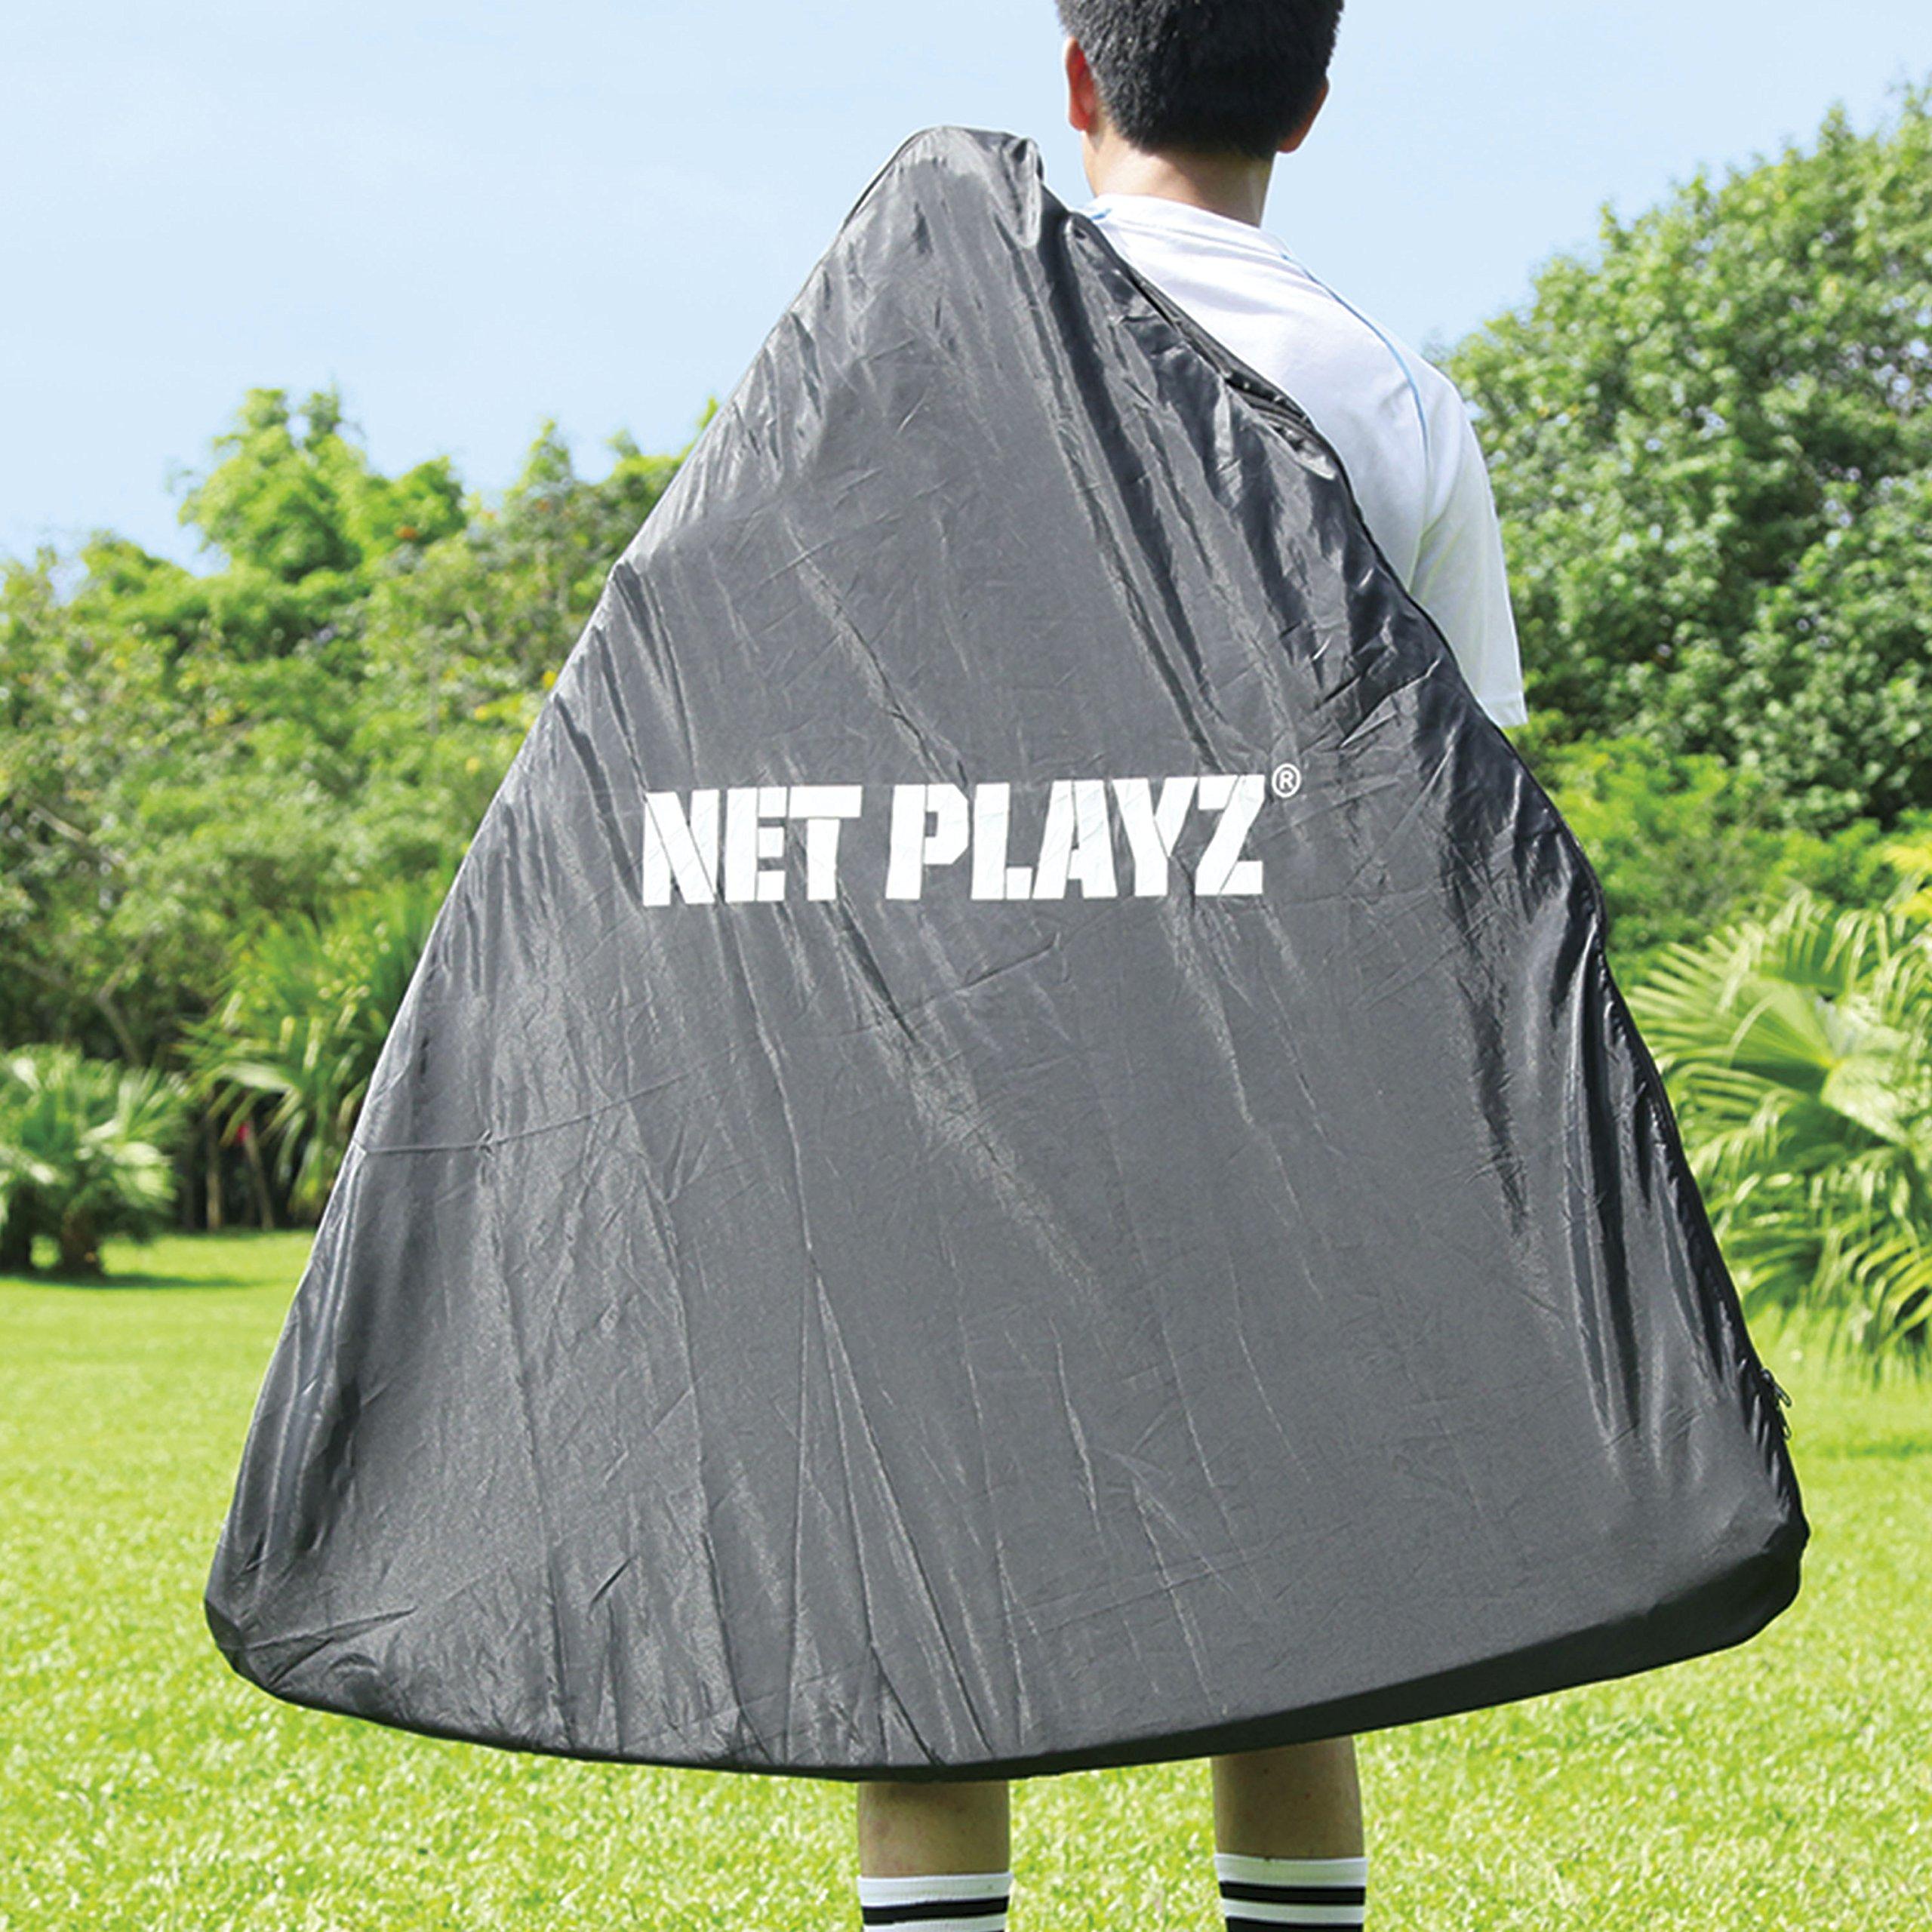 NET PLAYZ 4 x 4 x 4 Feet Lacrosse Goal Fast Install, Fiberglass Frme, Lightweight, Foldable, Portable, Carry bag Included by NET PLAYZ (Image #5)